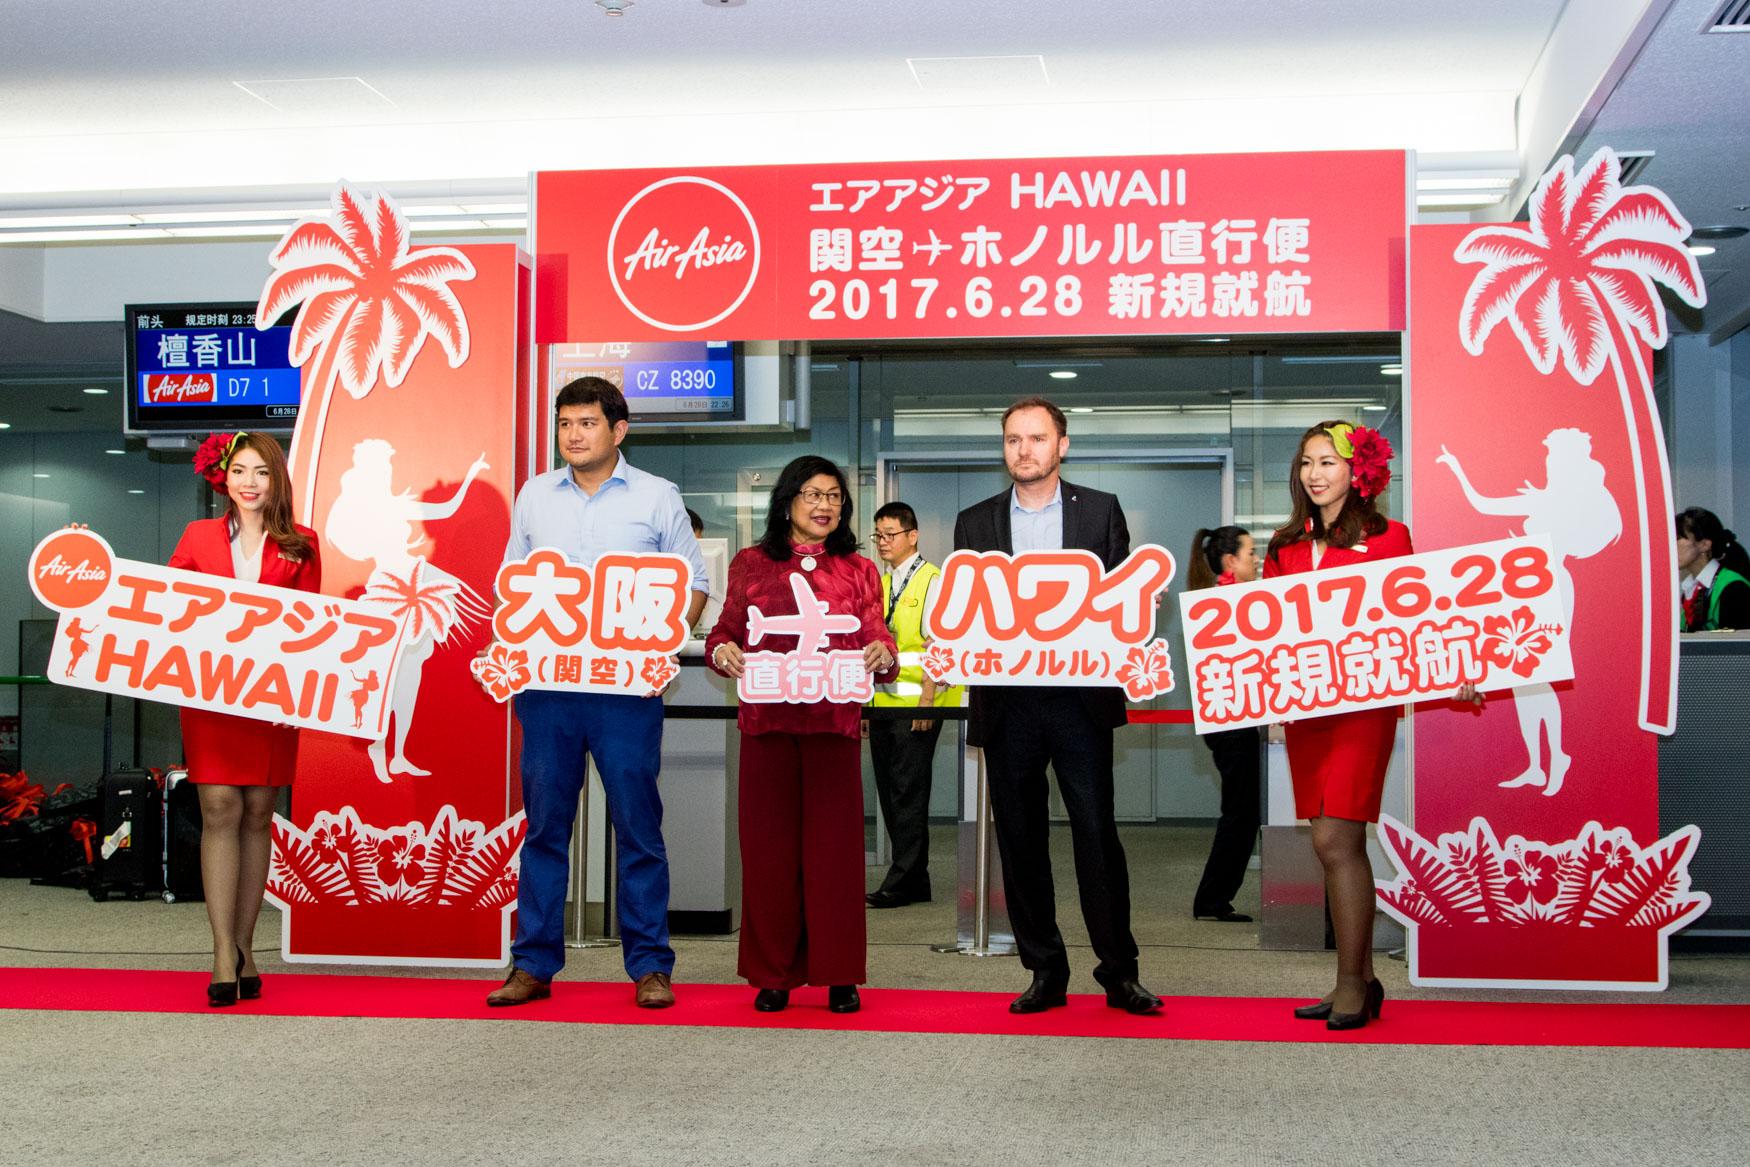 AirAsia X Inaugural Osaka to Honolulu Photo Shoot